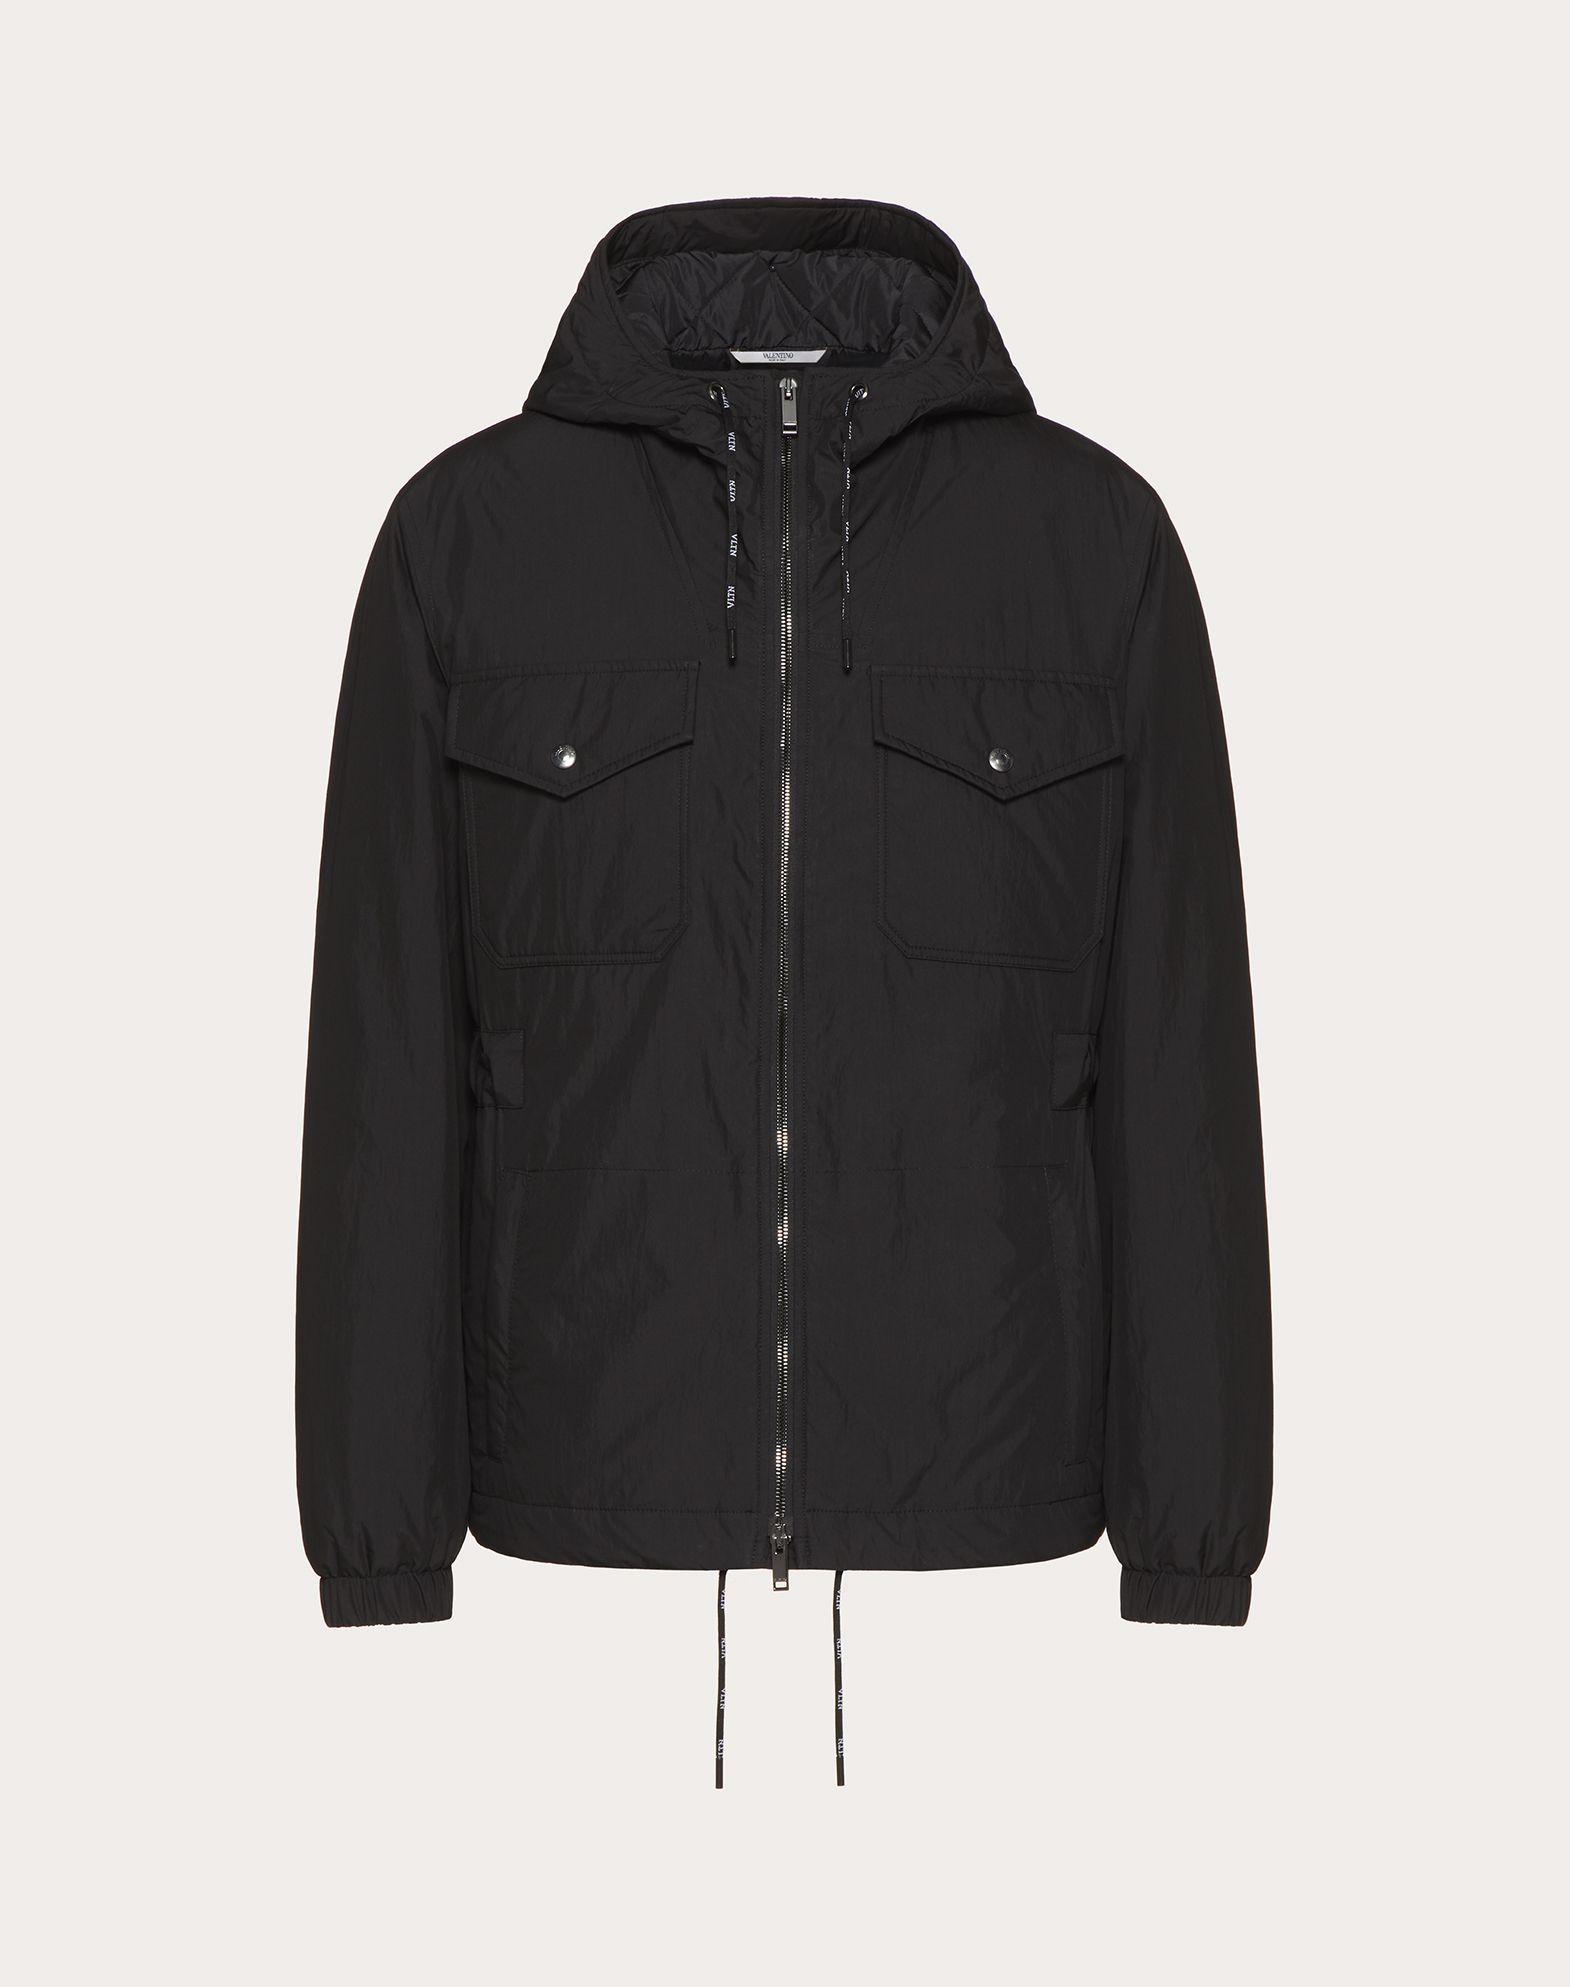 VALENTINO UOMO VLTN casual jacket PEA COAT U f